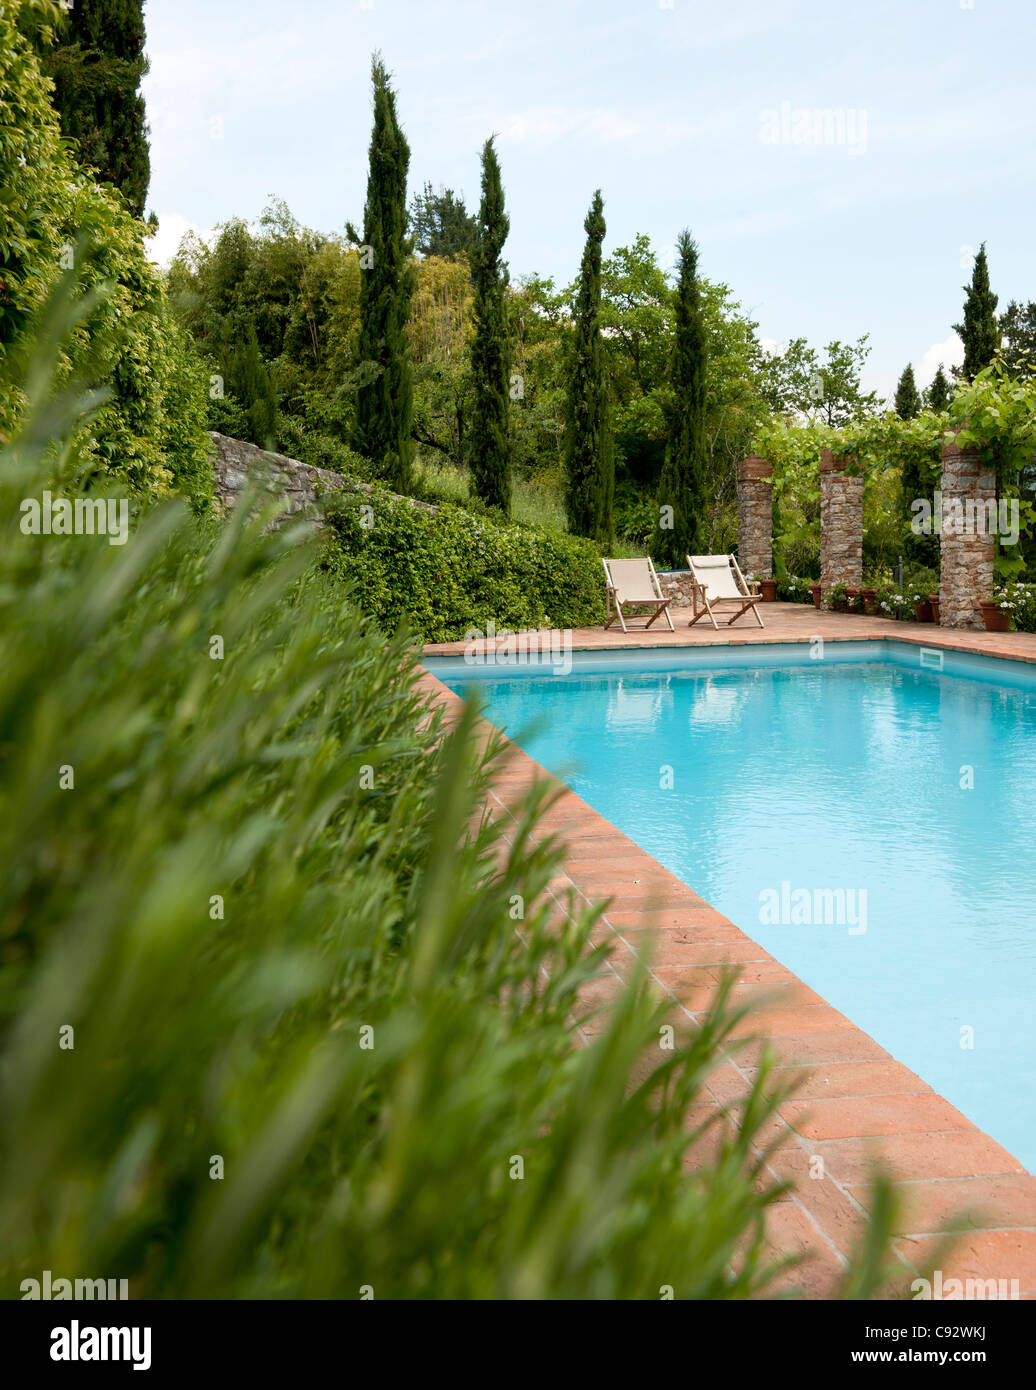 Tuscany villa italy pool stock photos tuscany villa - Hotels in lucca italy with swimming pool ...